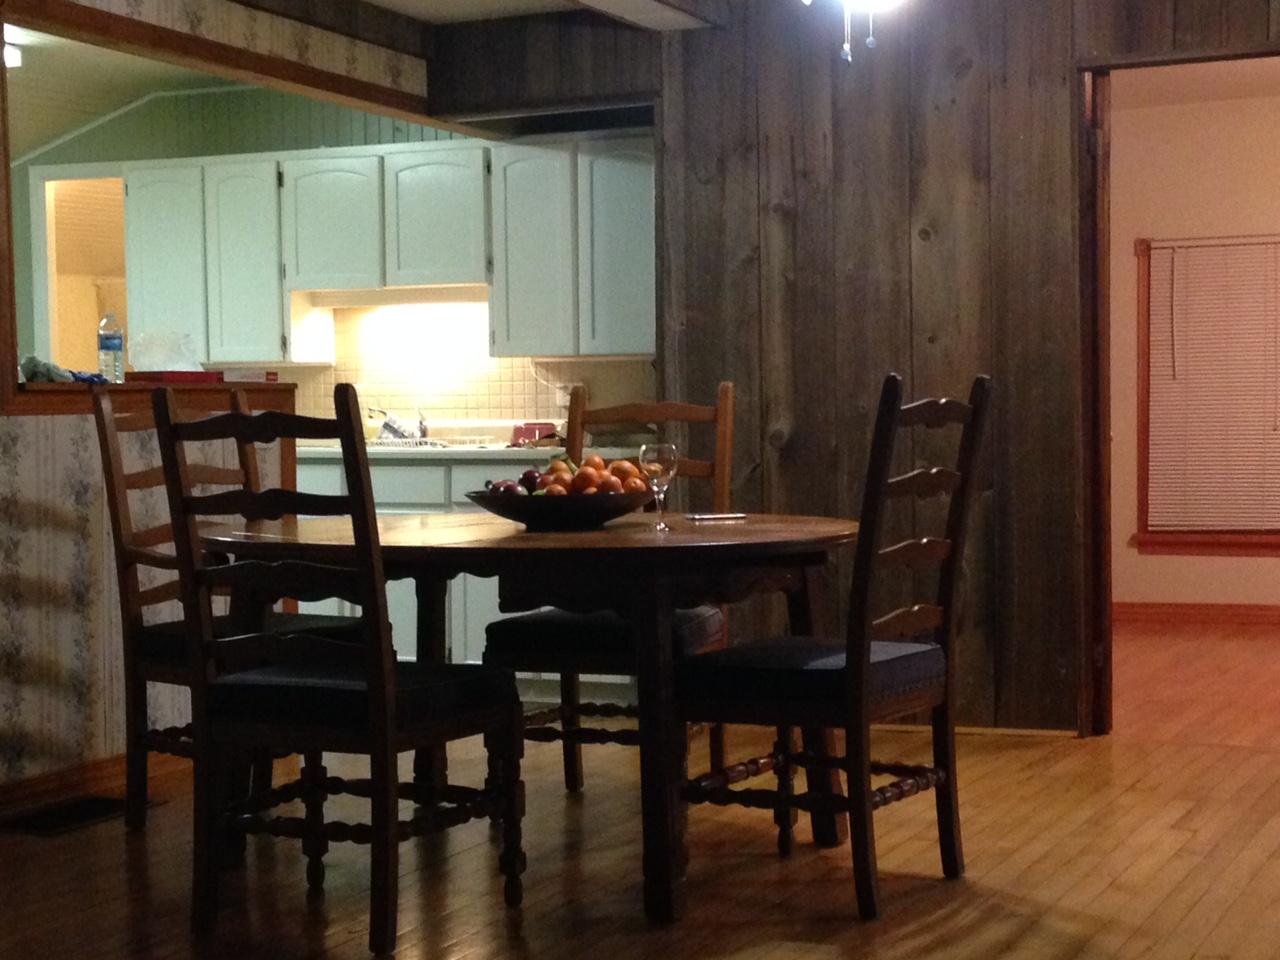 Loft dining kitchen.JPG